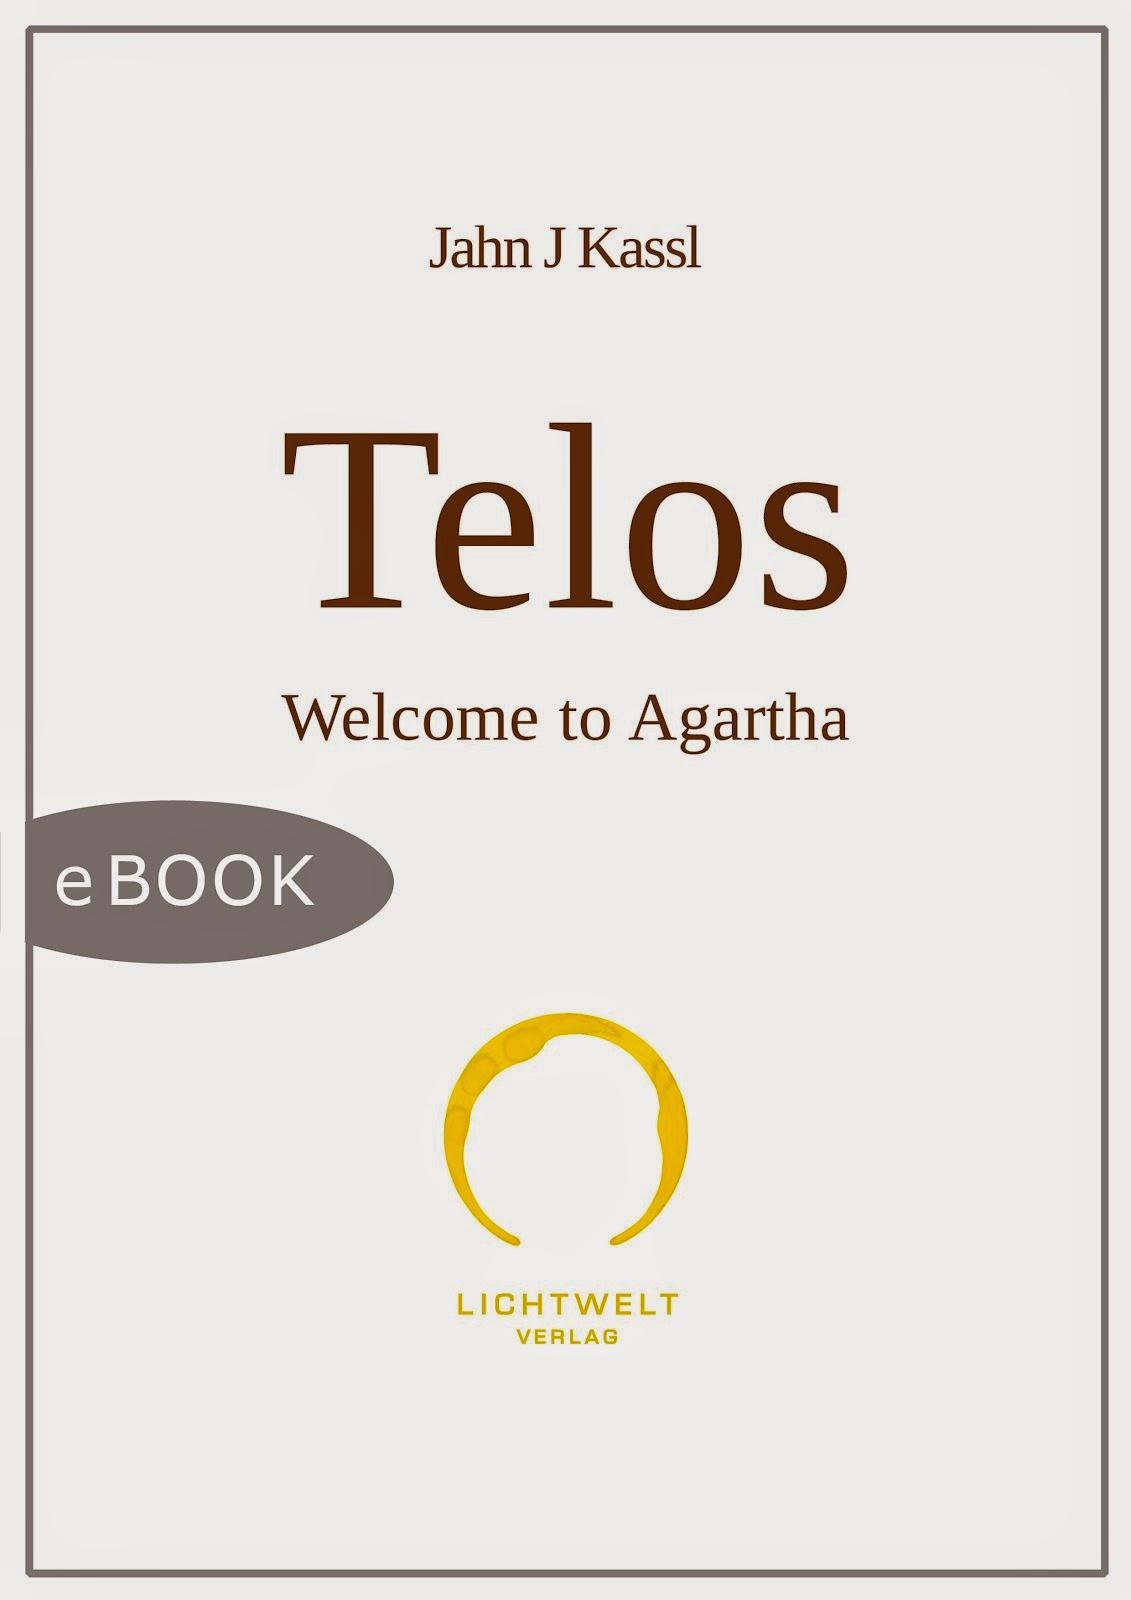 TELOS, Welcome to Agartha - JJK (digital publication)